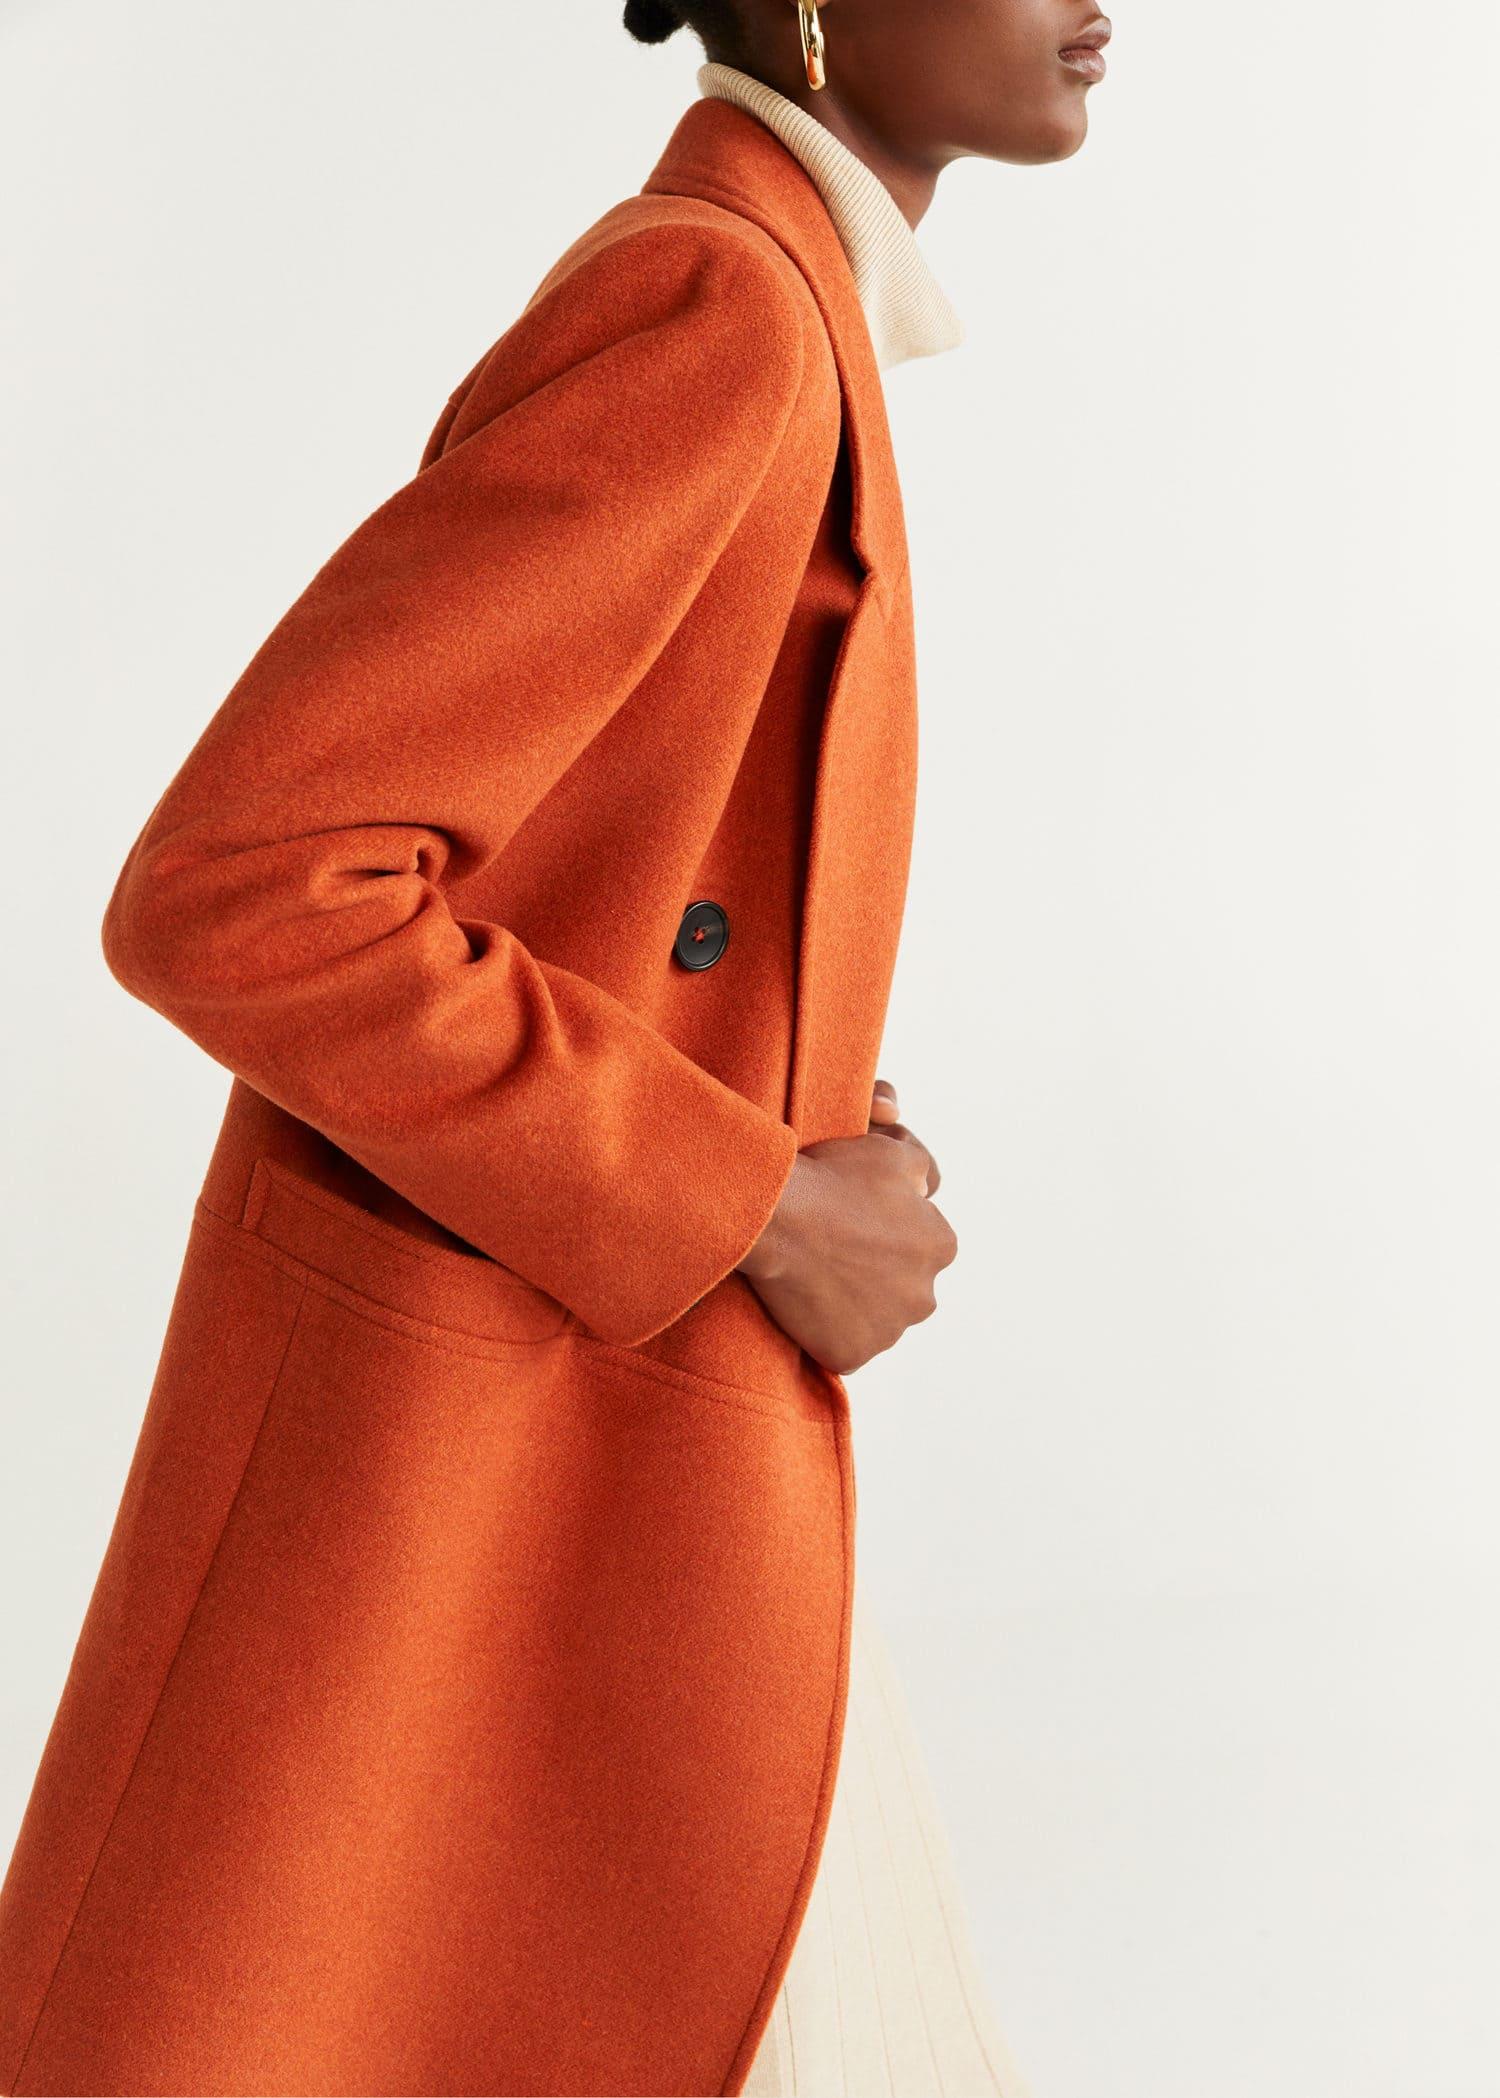 Structured wool coat Woman | Mango Ireland